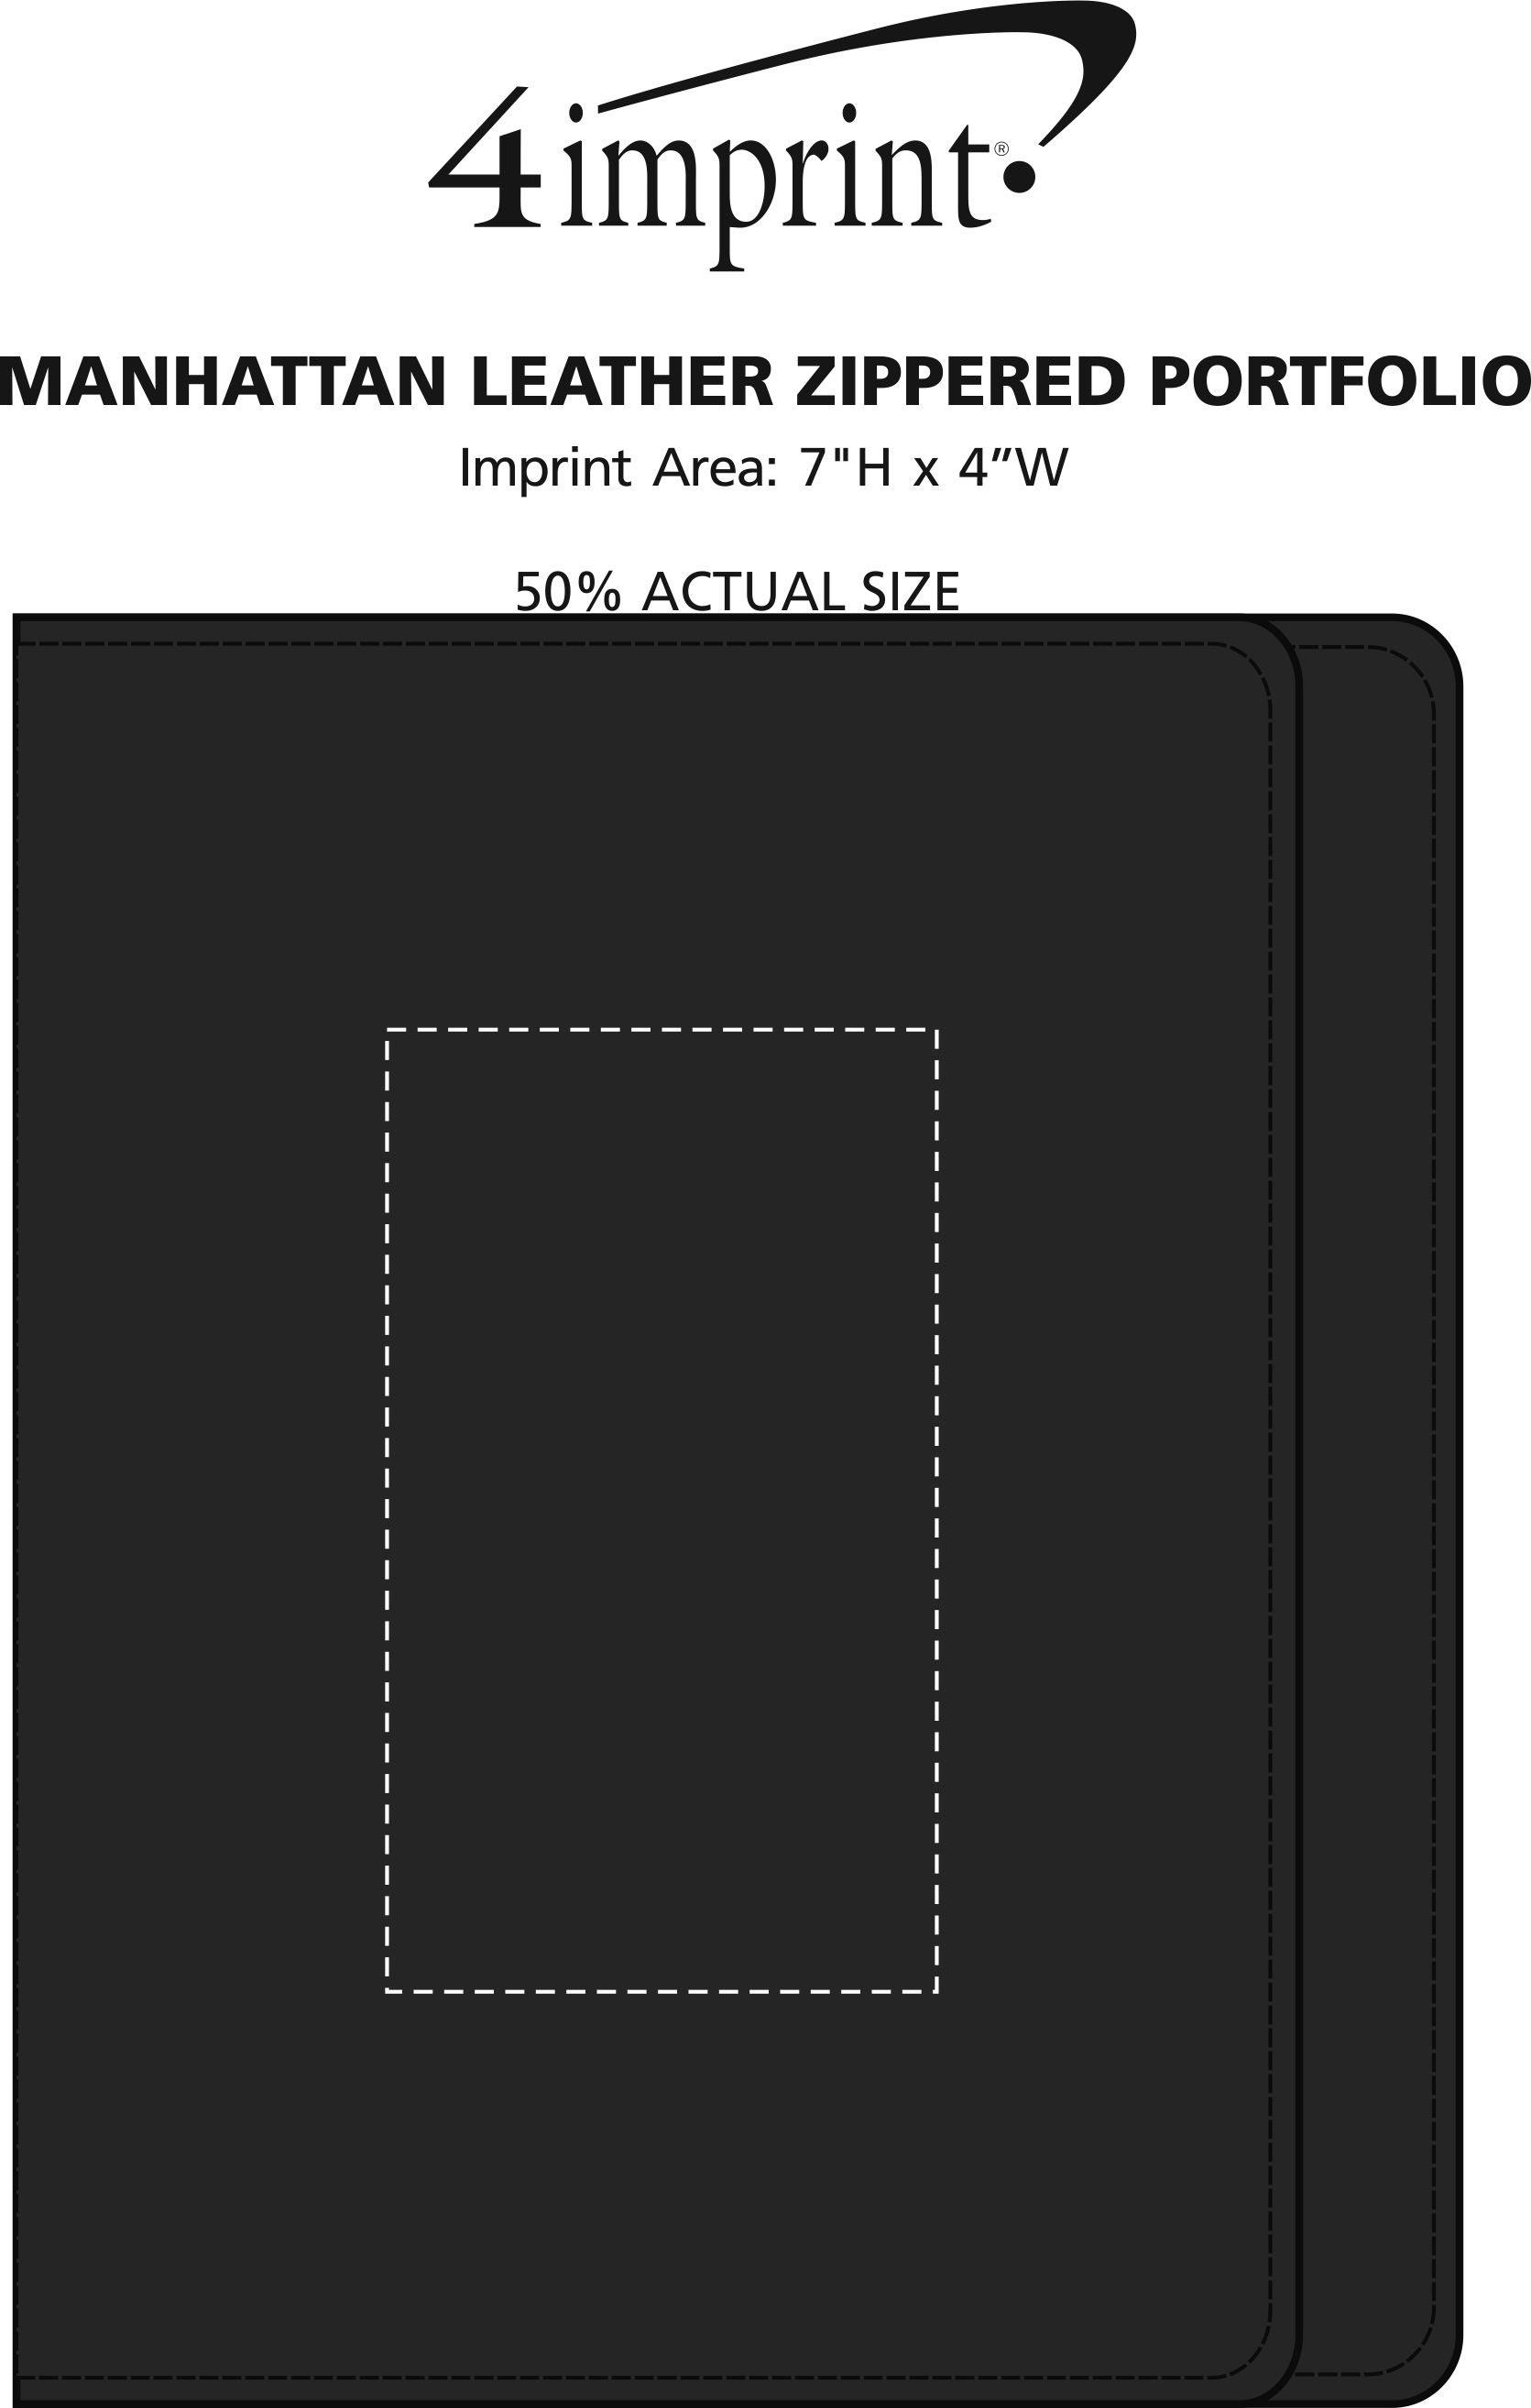 Imprint Area of Manhattan Leather Zippered Portfolio